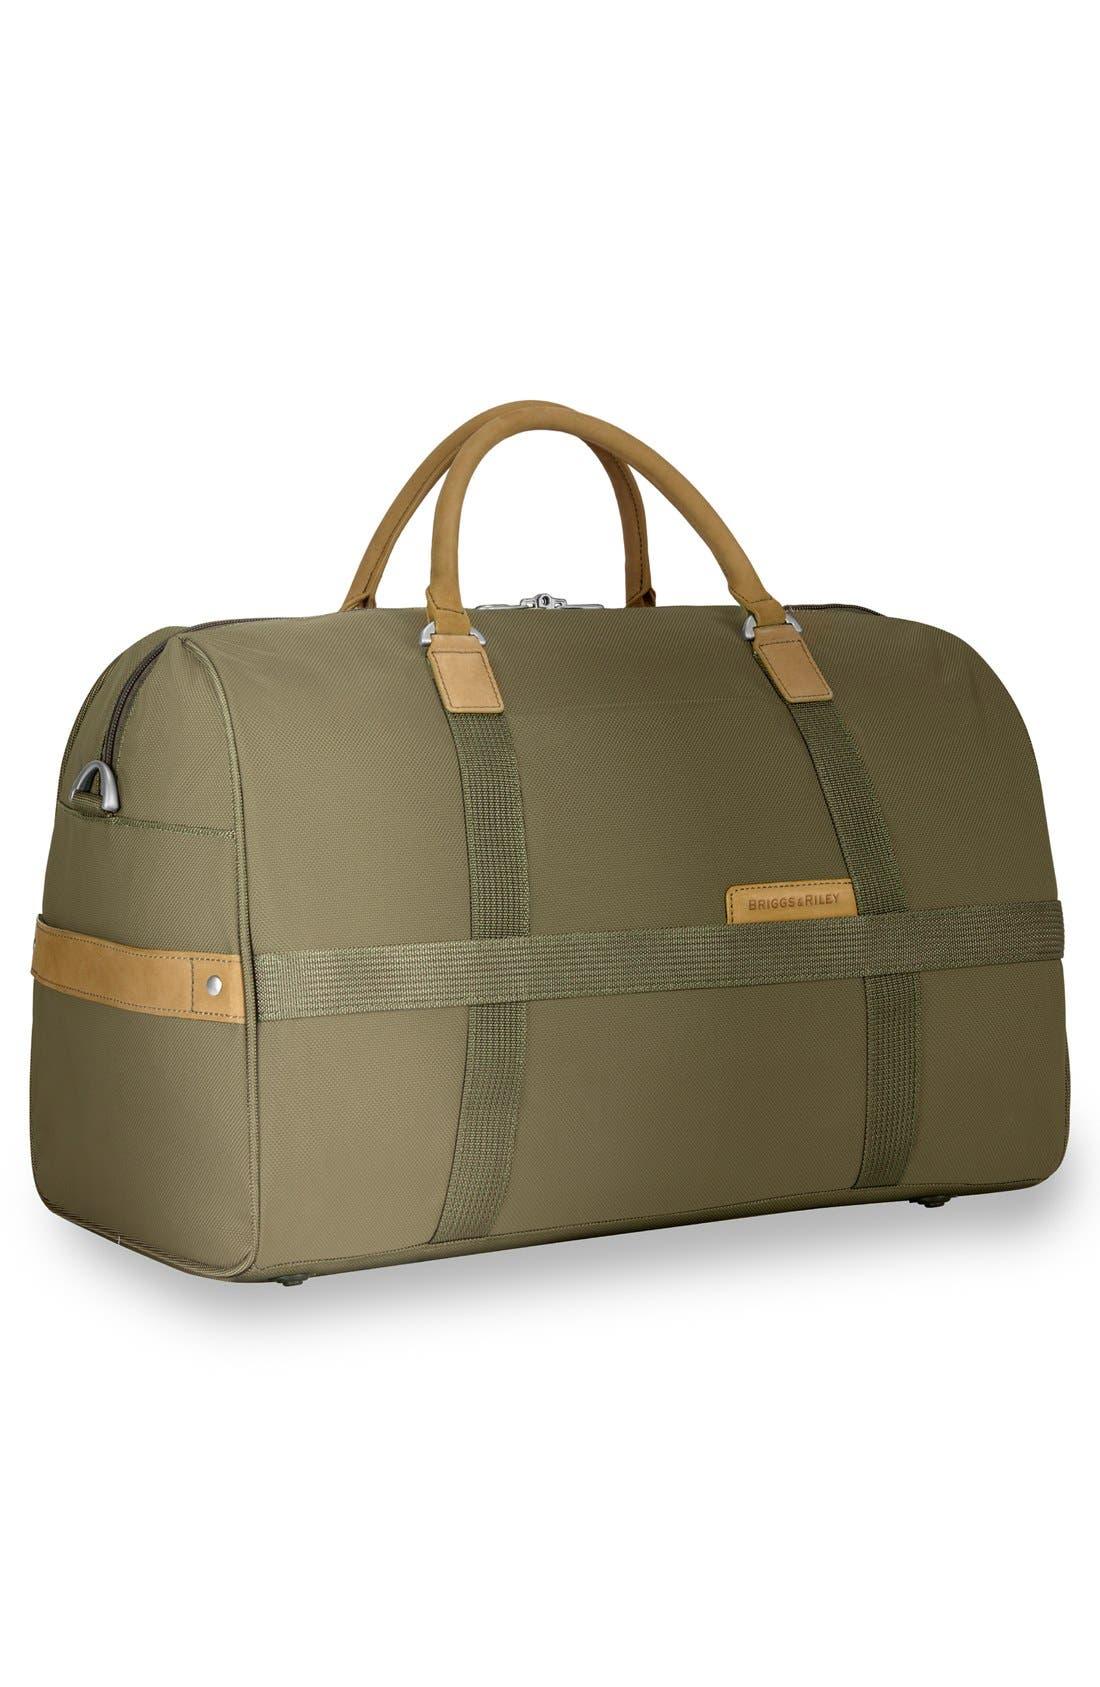 'Baseline - Medium' Duffel Bag,                             Alternate thumbnail 4, color,                             310